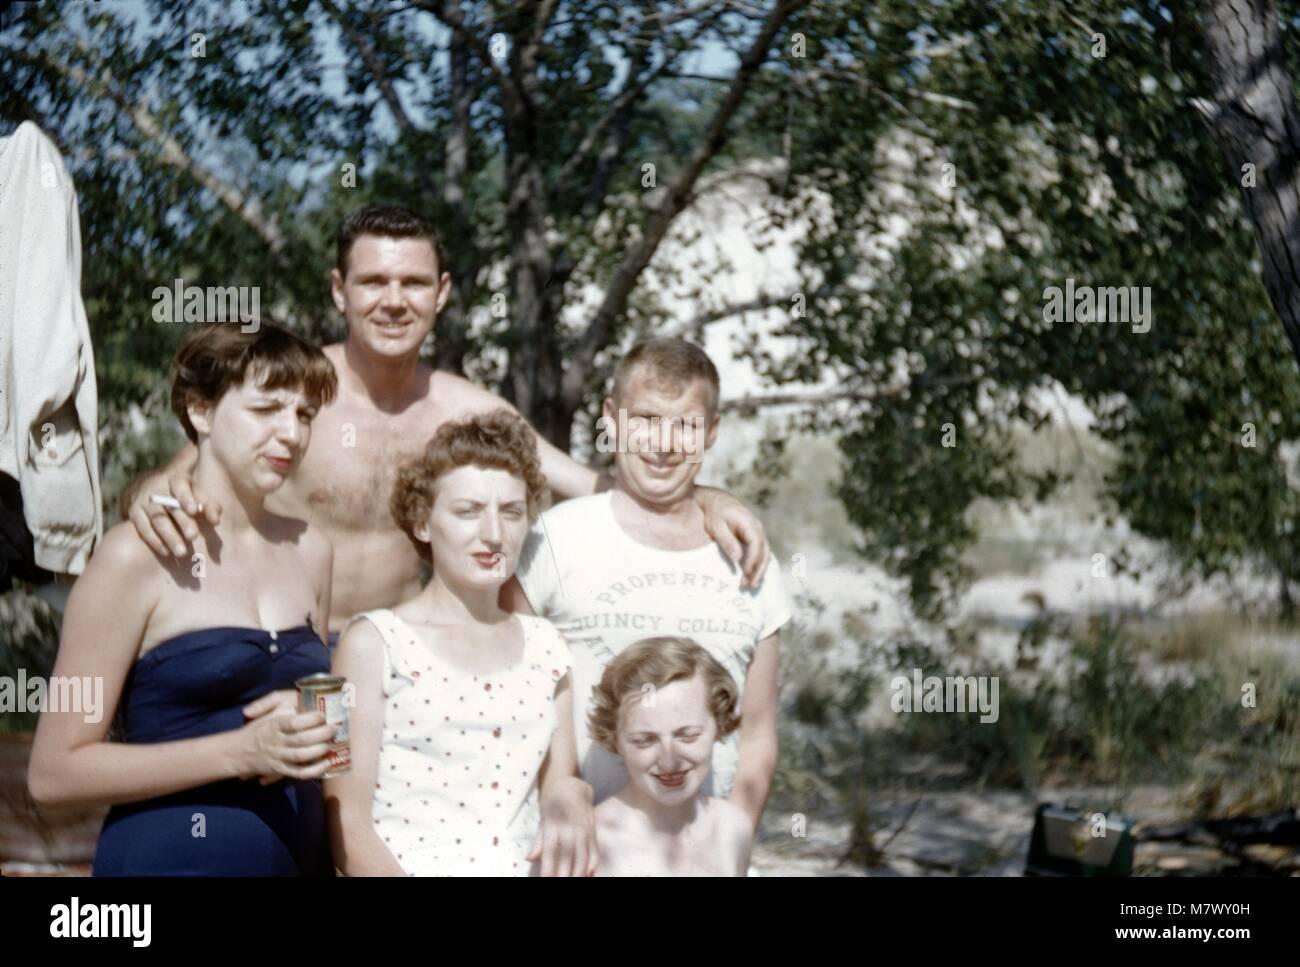 Vintage archival photograph taken in 1970 - Stock Image